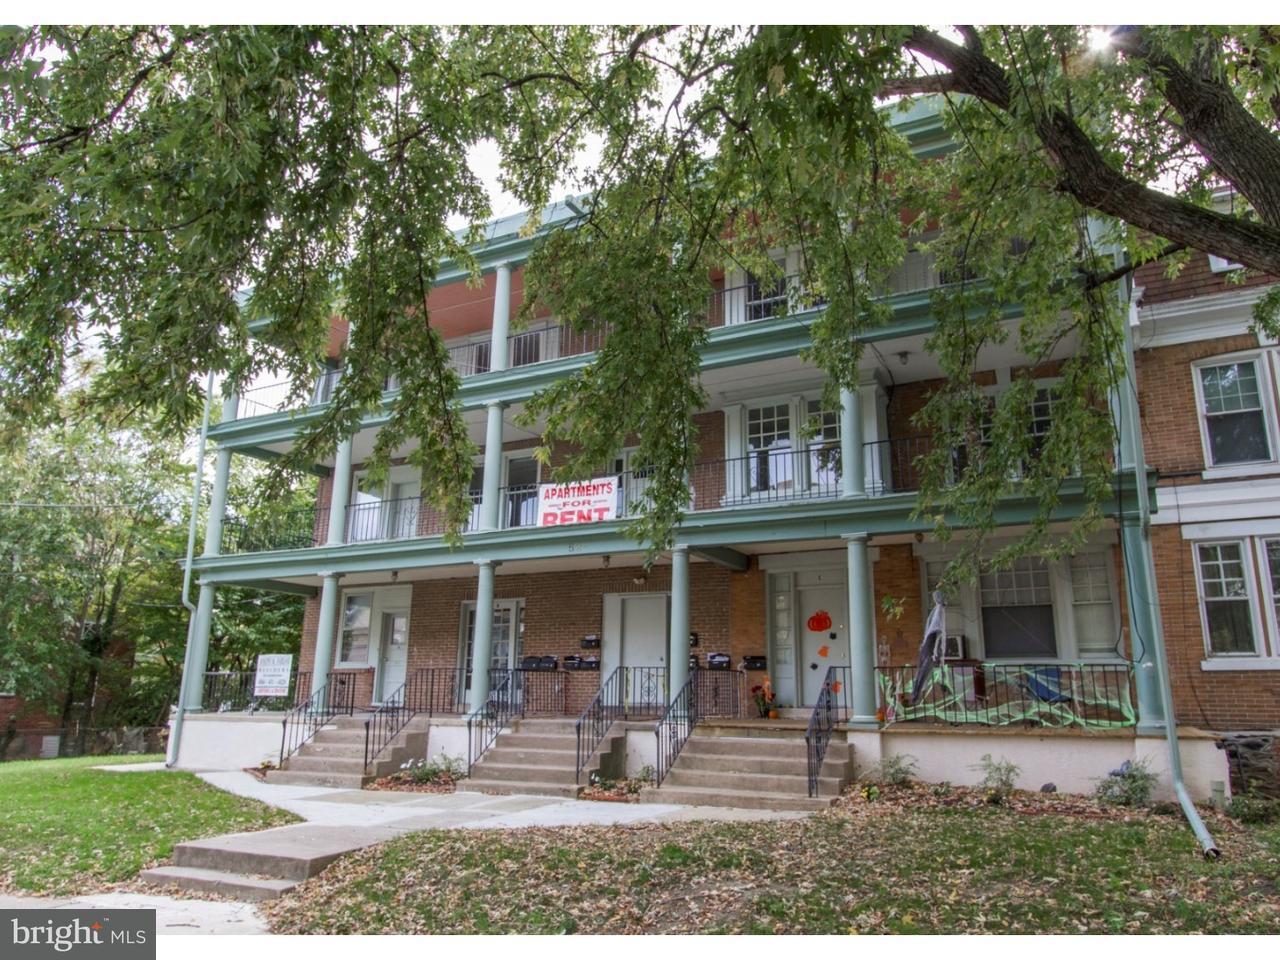 Single Family Home for Rent at 52-54 E STRATFORD AVE #G Lansdowne, Pennsylvania 19050 United States